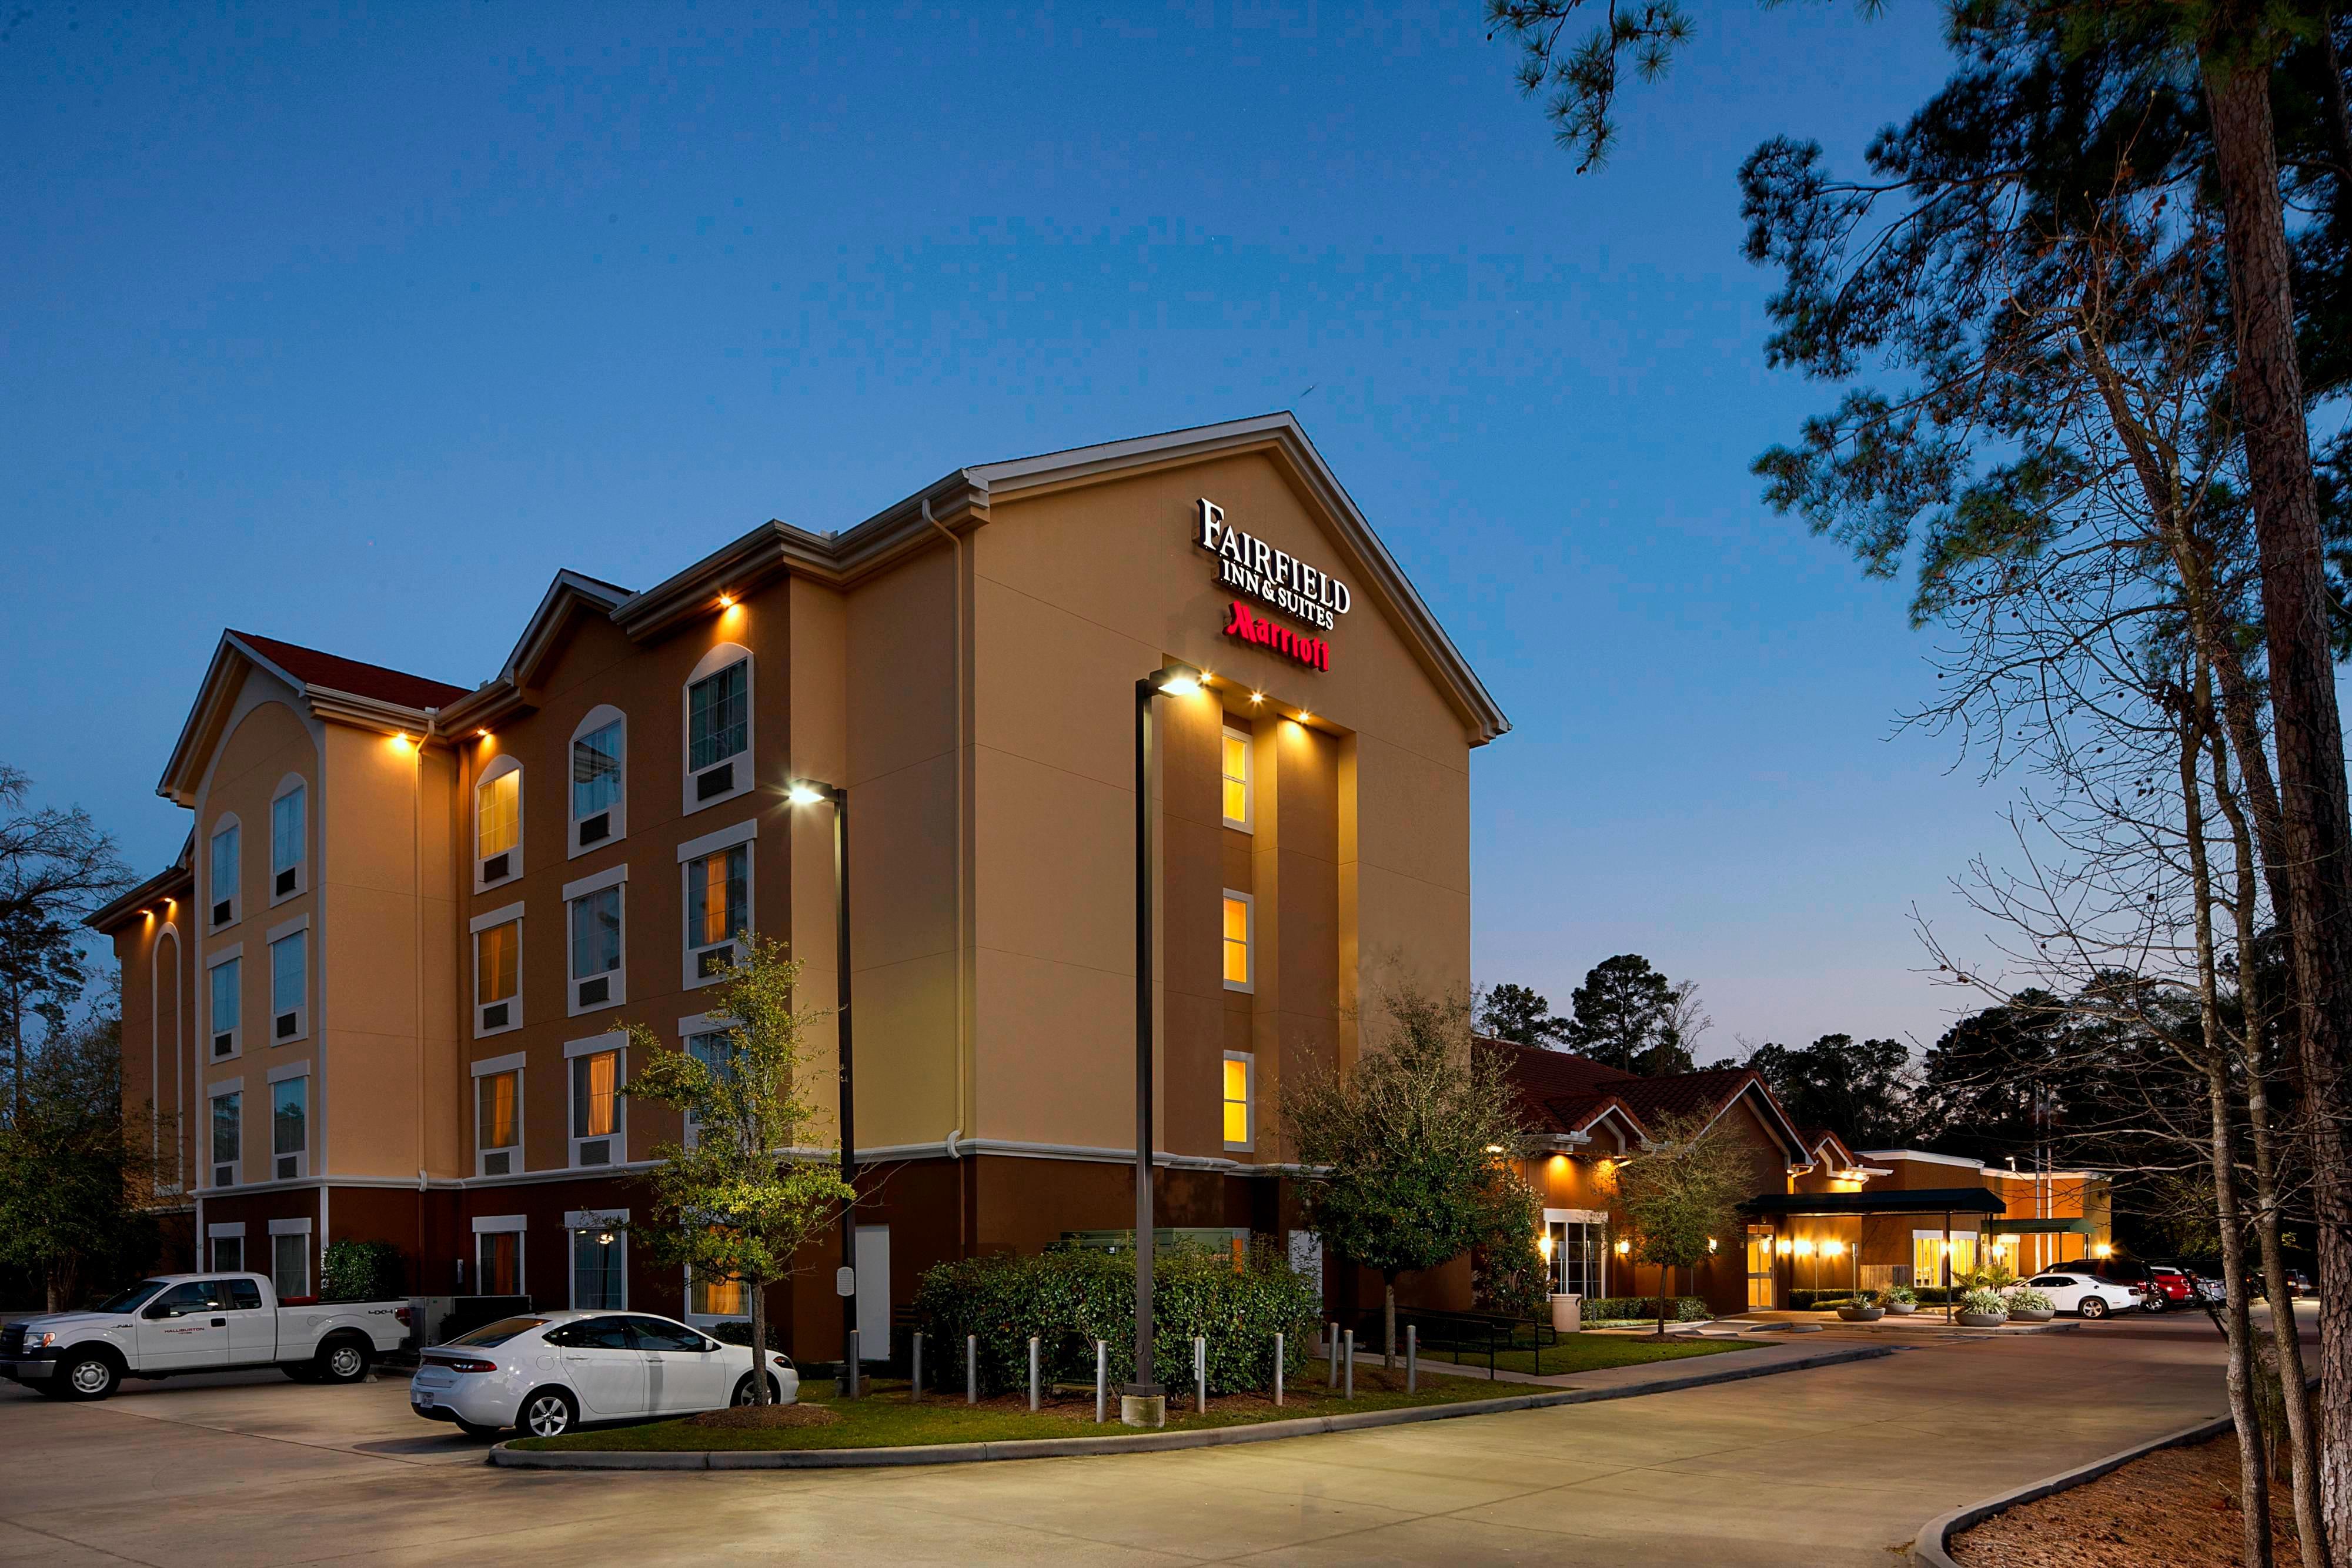 Fairfield Inn & Suites By Marriott Houston Intercontinental Ap